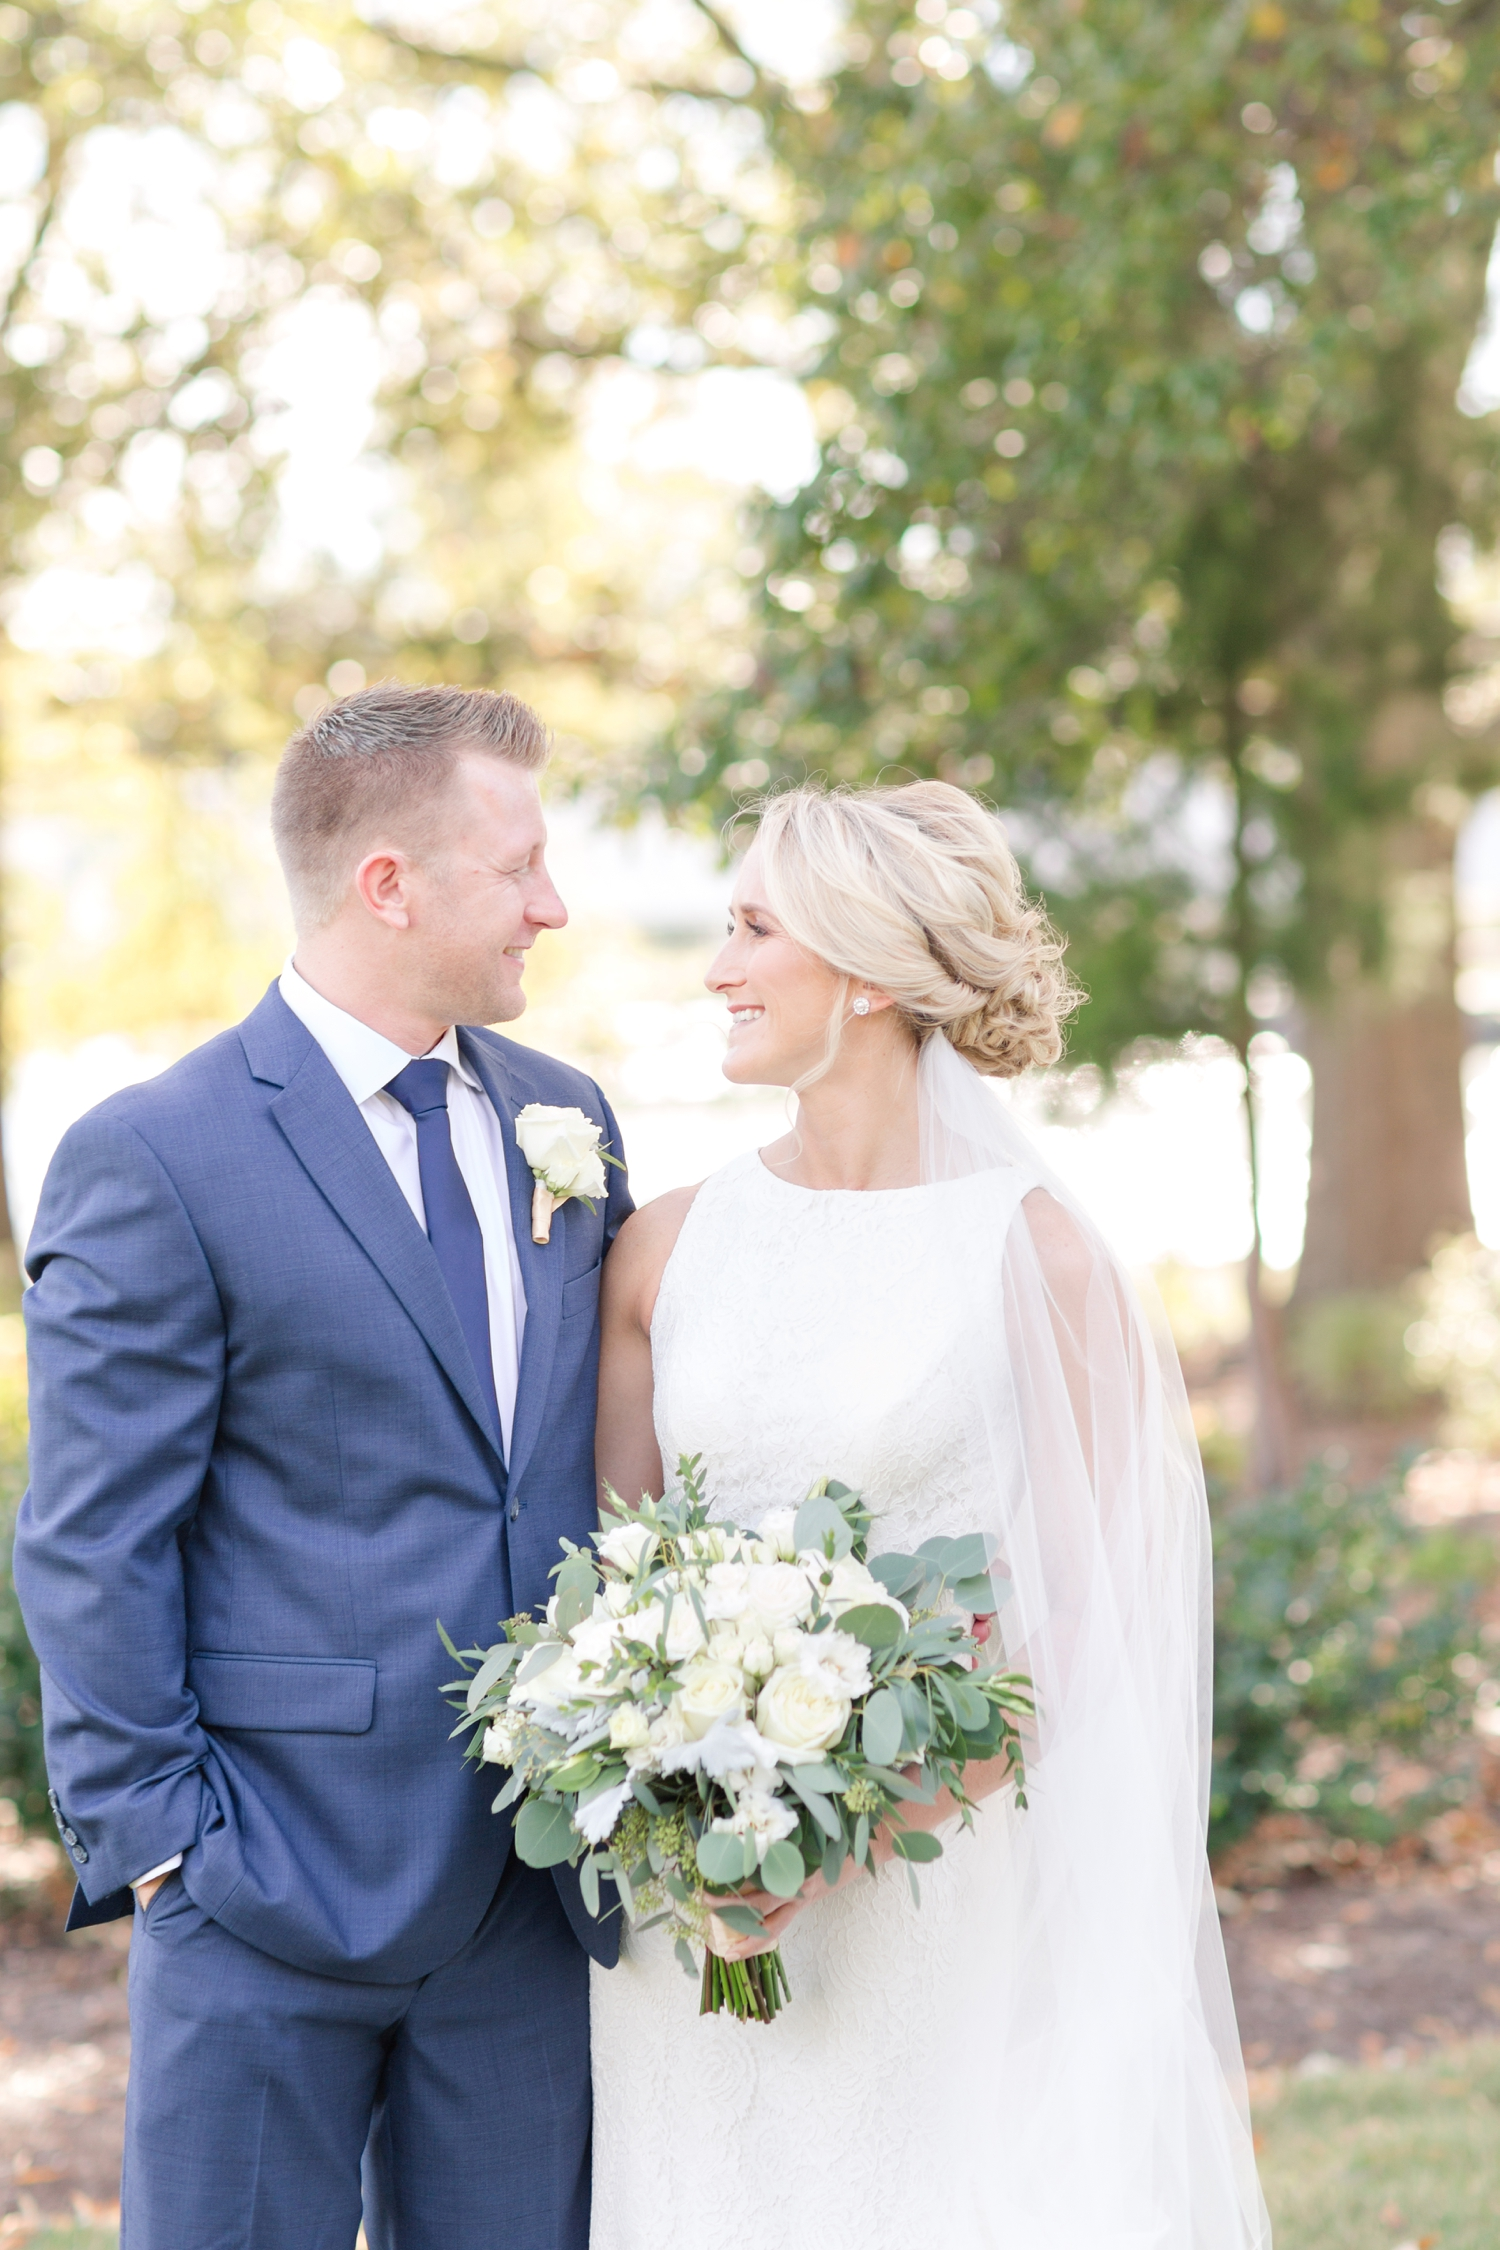 Wojciechowski Wedding-159_the-oaks-waterfront-inn-wedding-easton-maryland-wedding-photography-anna-grace-photography-photo.jpg